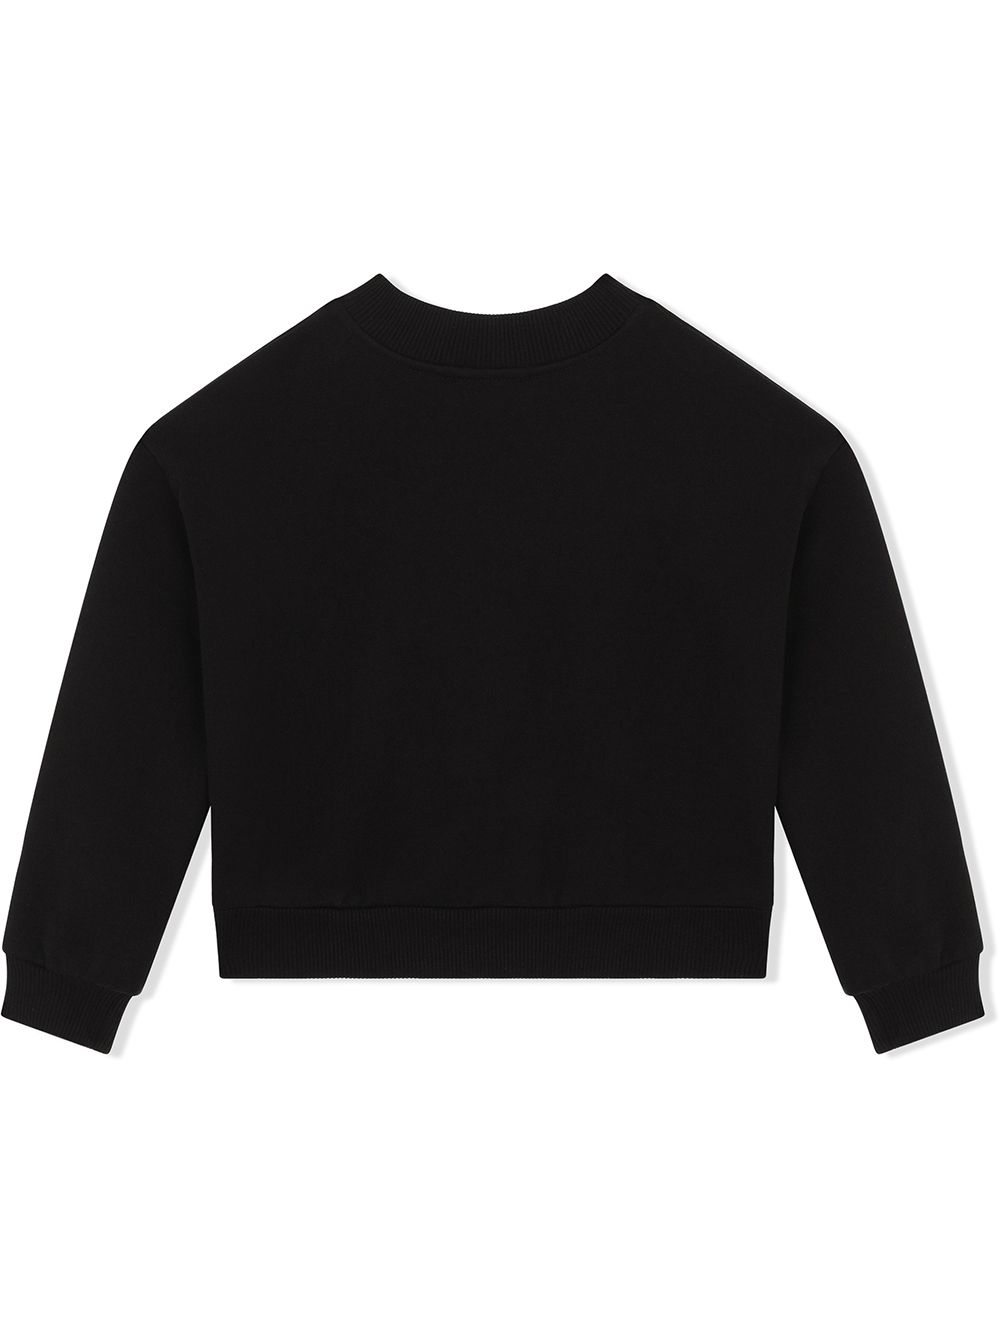 Sweatshirt Dolce & Gabbana kids DOLCE&GABBANA KIDS | -108764232 | L5JW4PG7BBUHN3EP